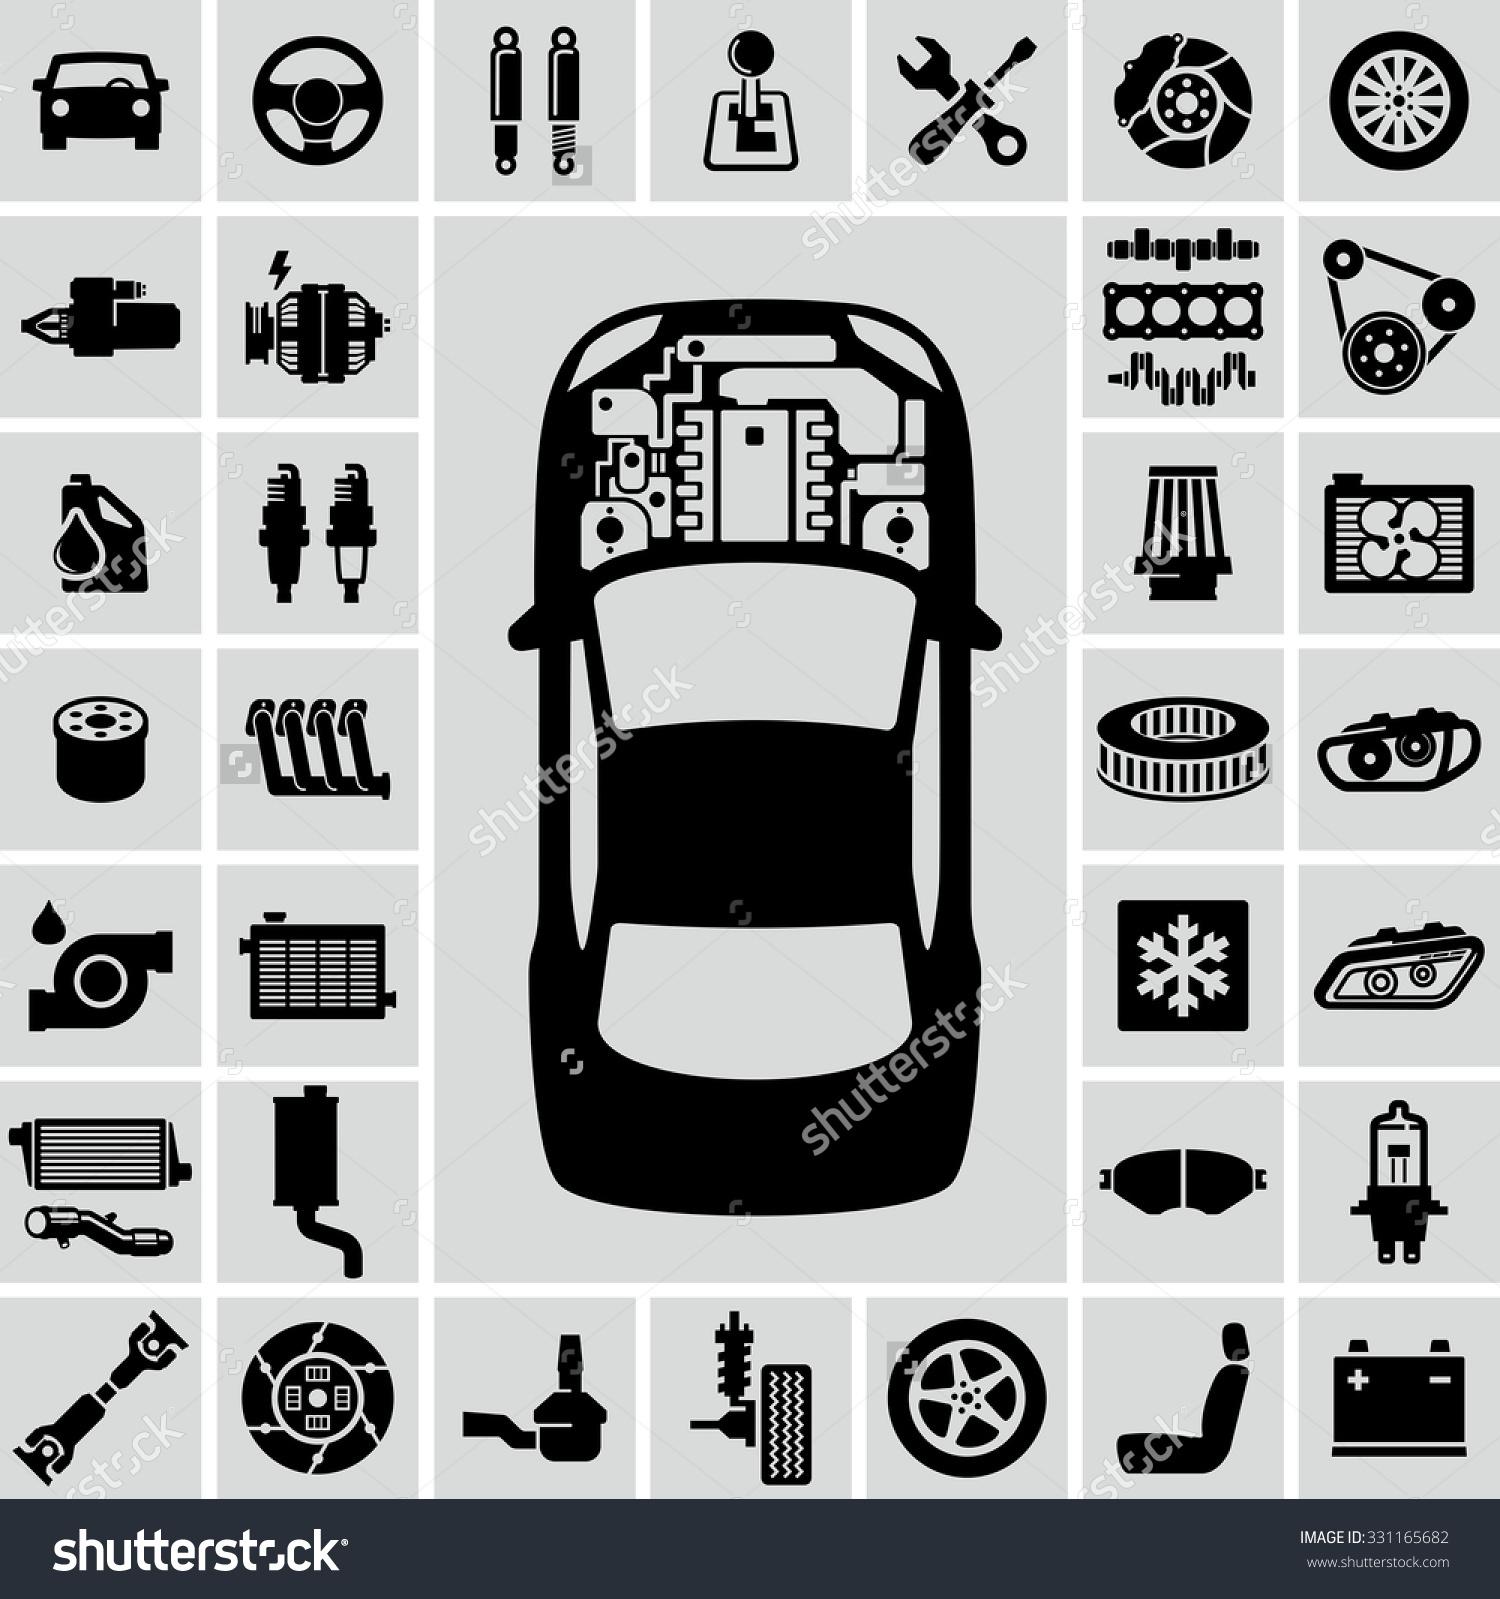 Simple clipart car engine #10